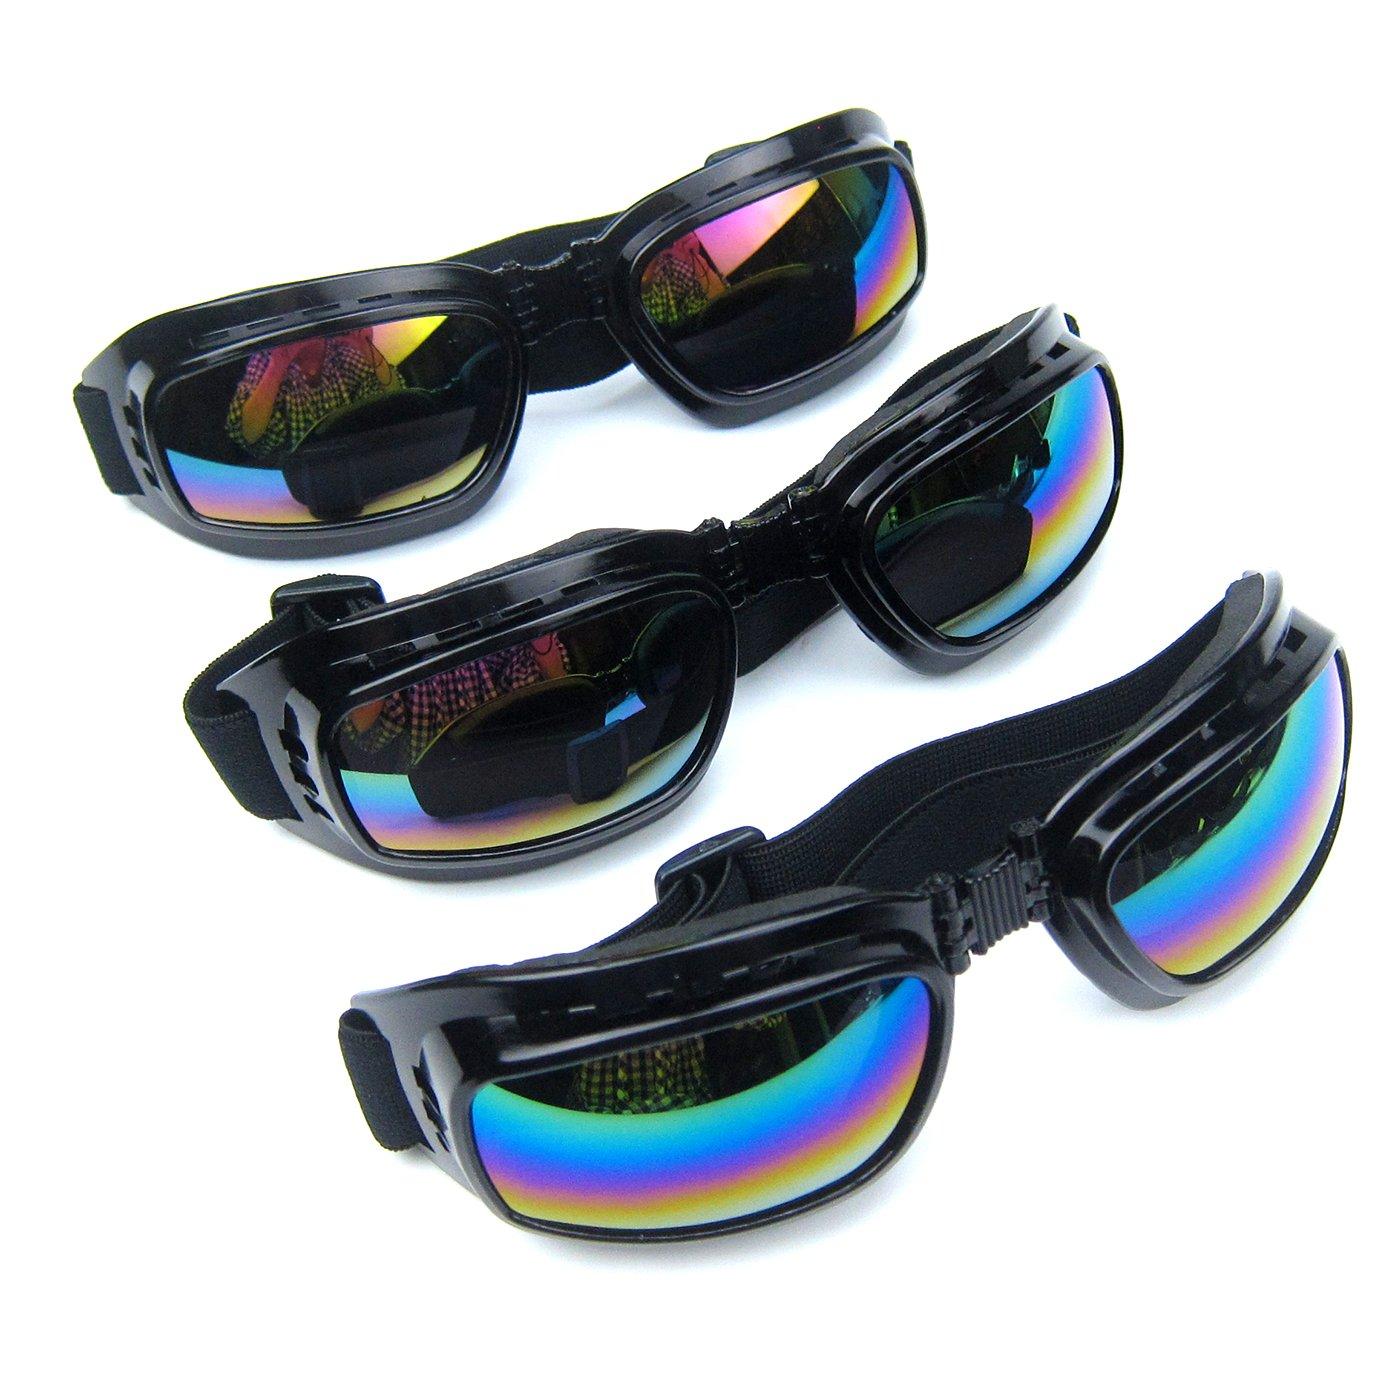 Alfie Pet by Petoga Couture - Brio 3-Piece Set Sun Glasses for Dogs and Cats - Color: Black